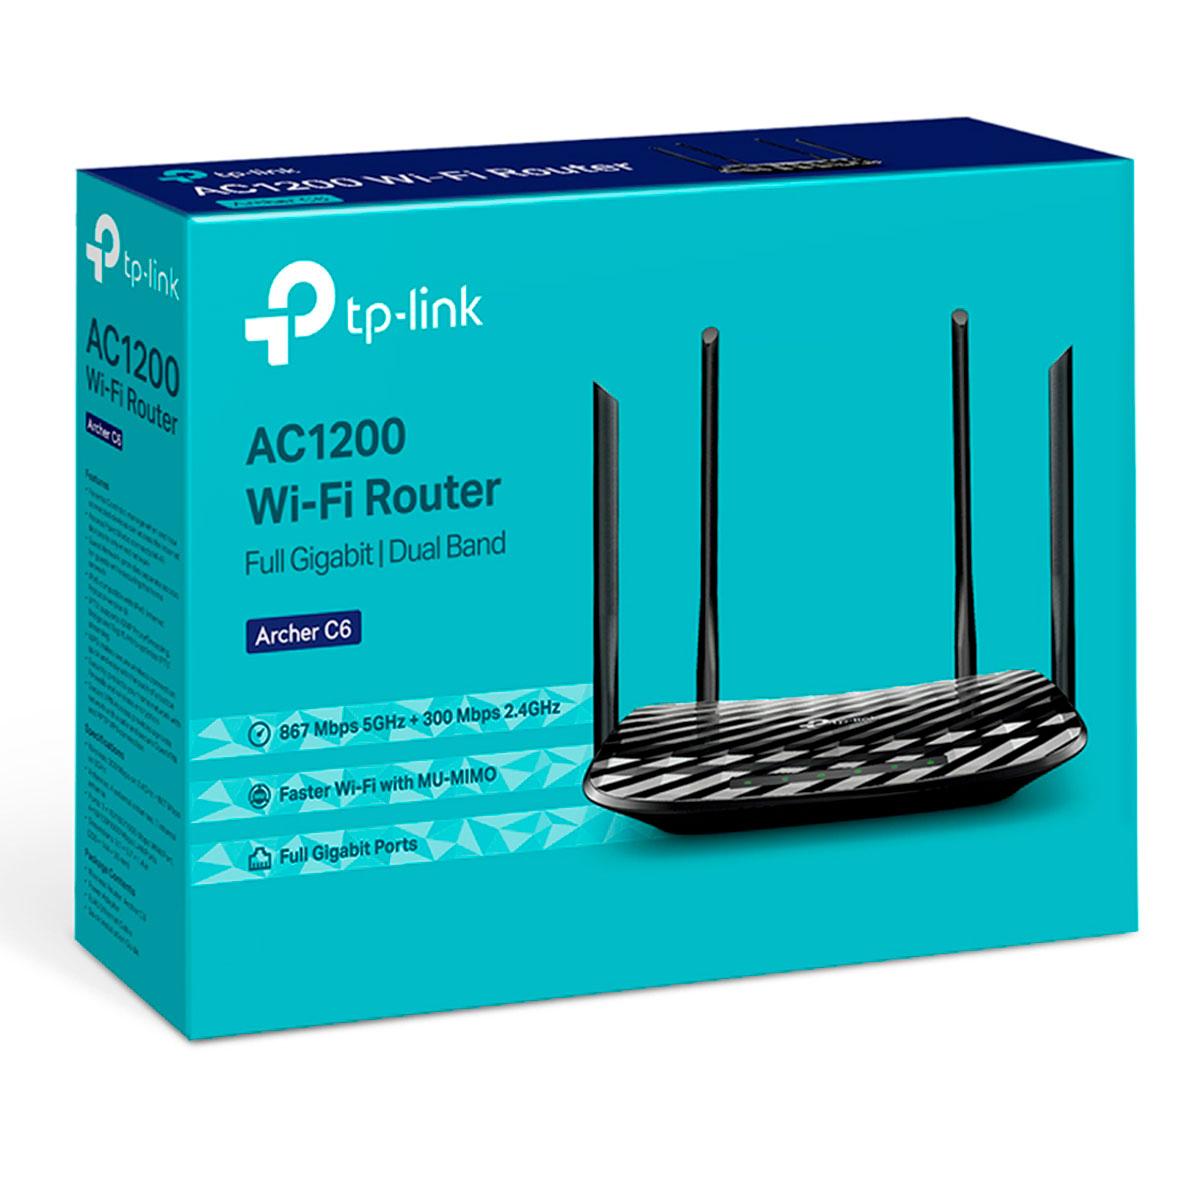 Roteador Wireless TP-Link Archer C6, Dual Band (2.4GHz/5GHz), AC1200, Gigabit, Mu-Mimo, 4 Antenas